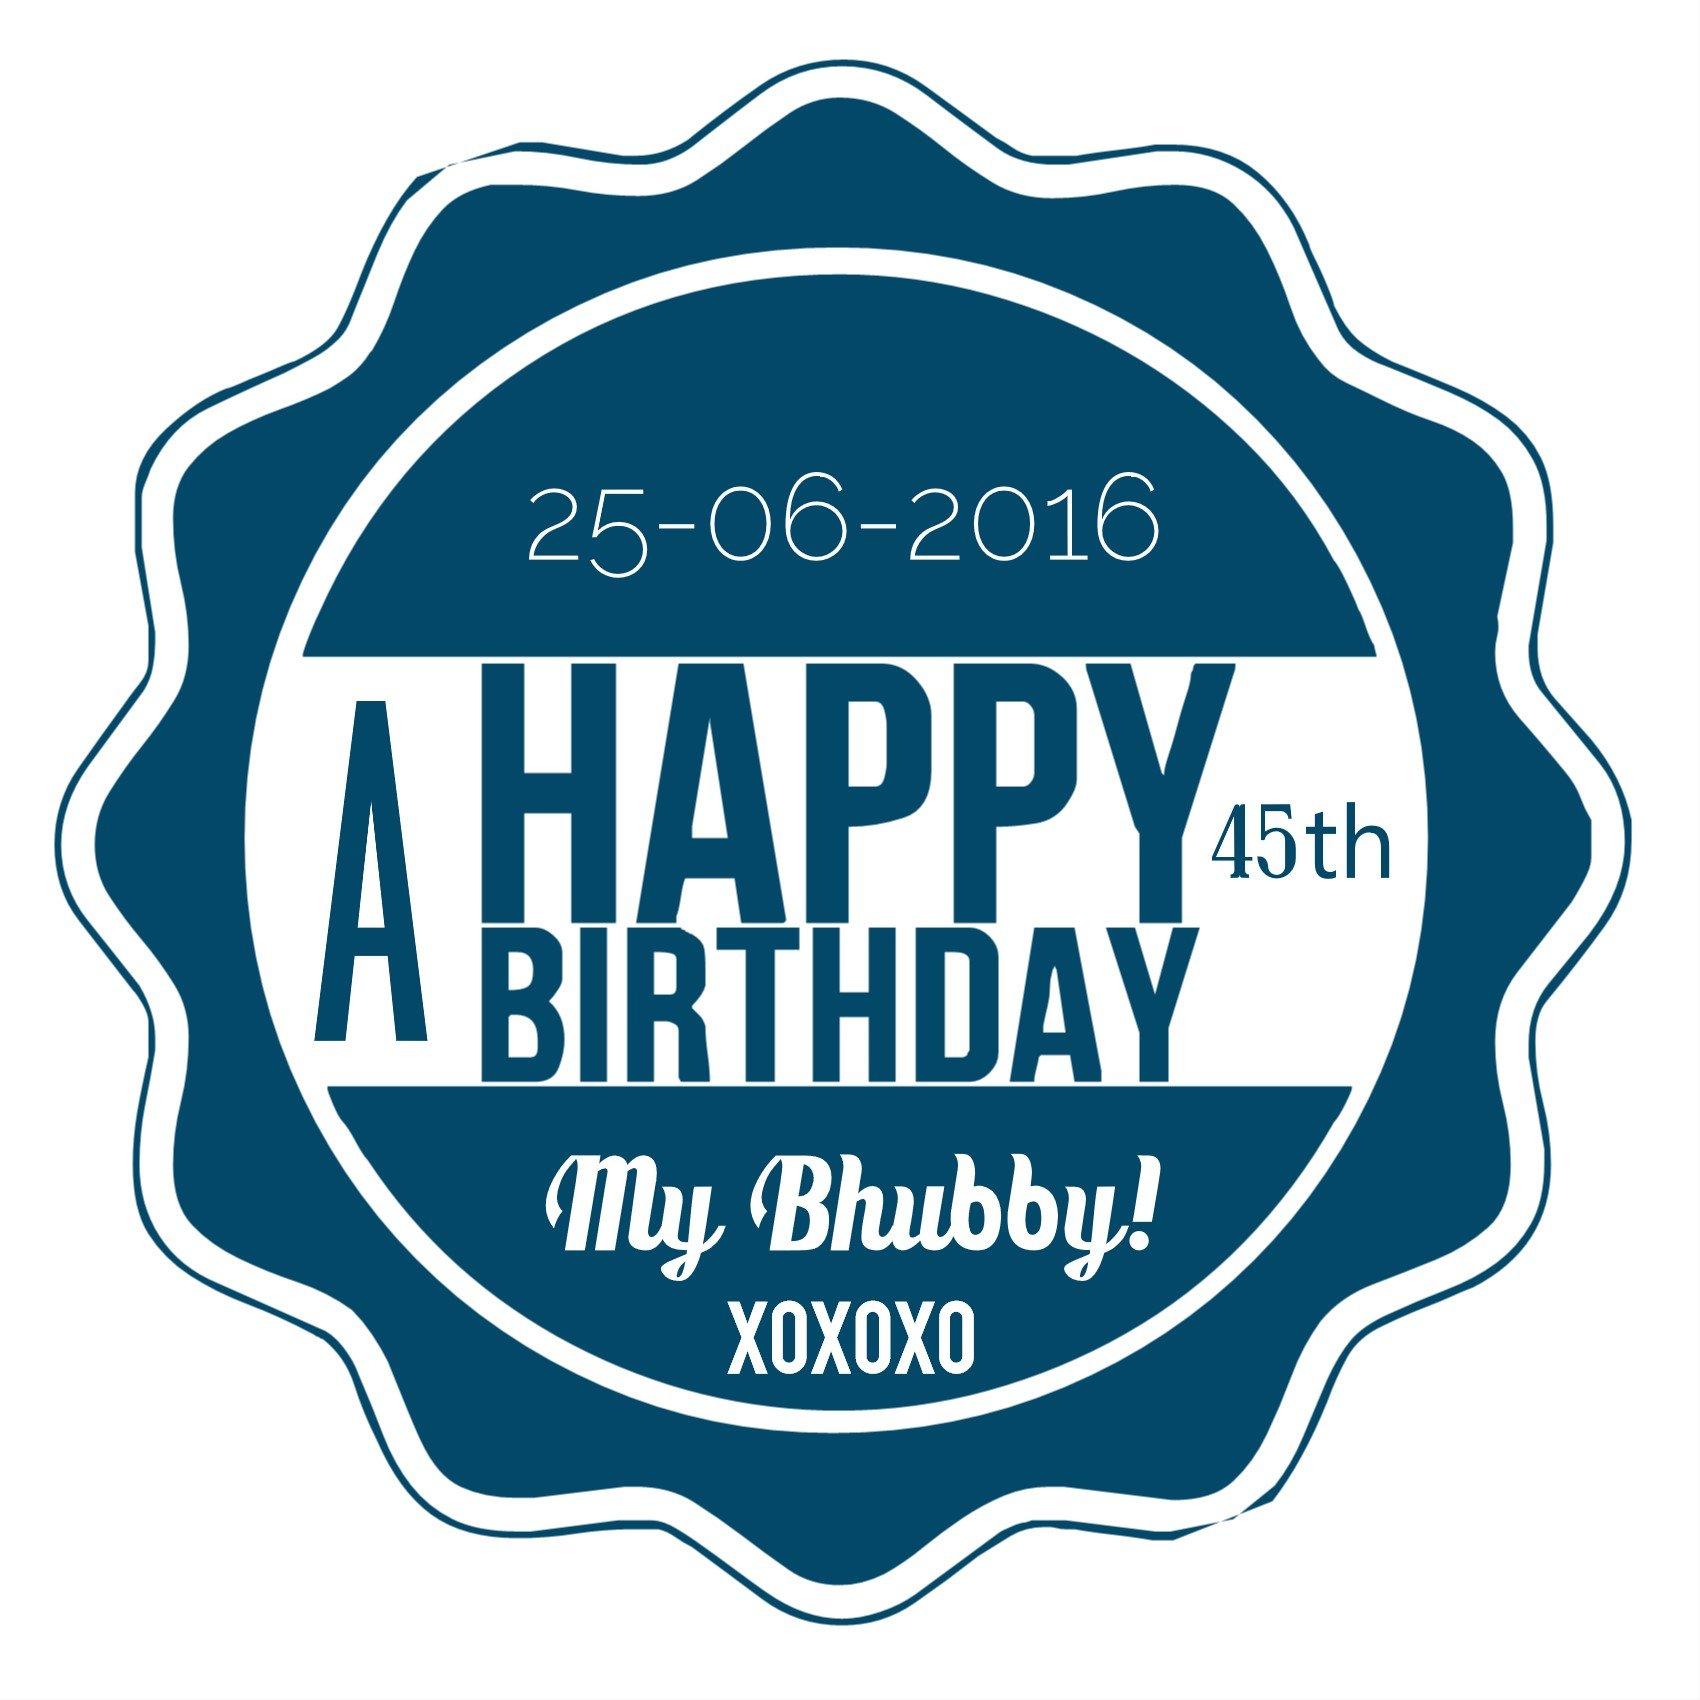 Happy 45th Birthday Bhubby!